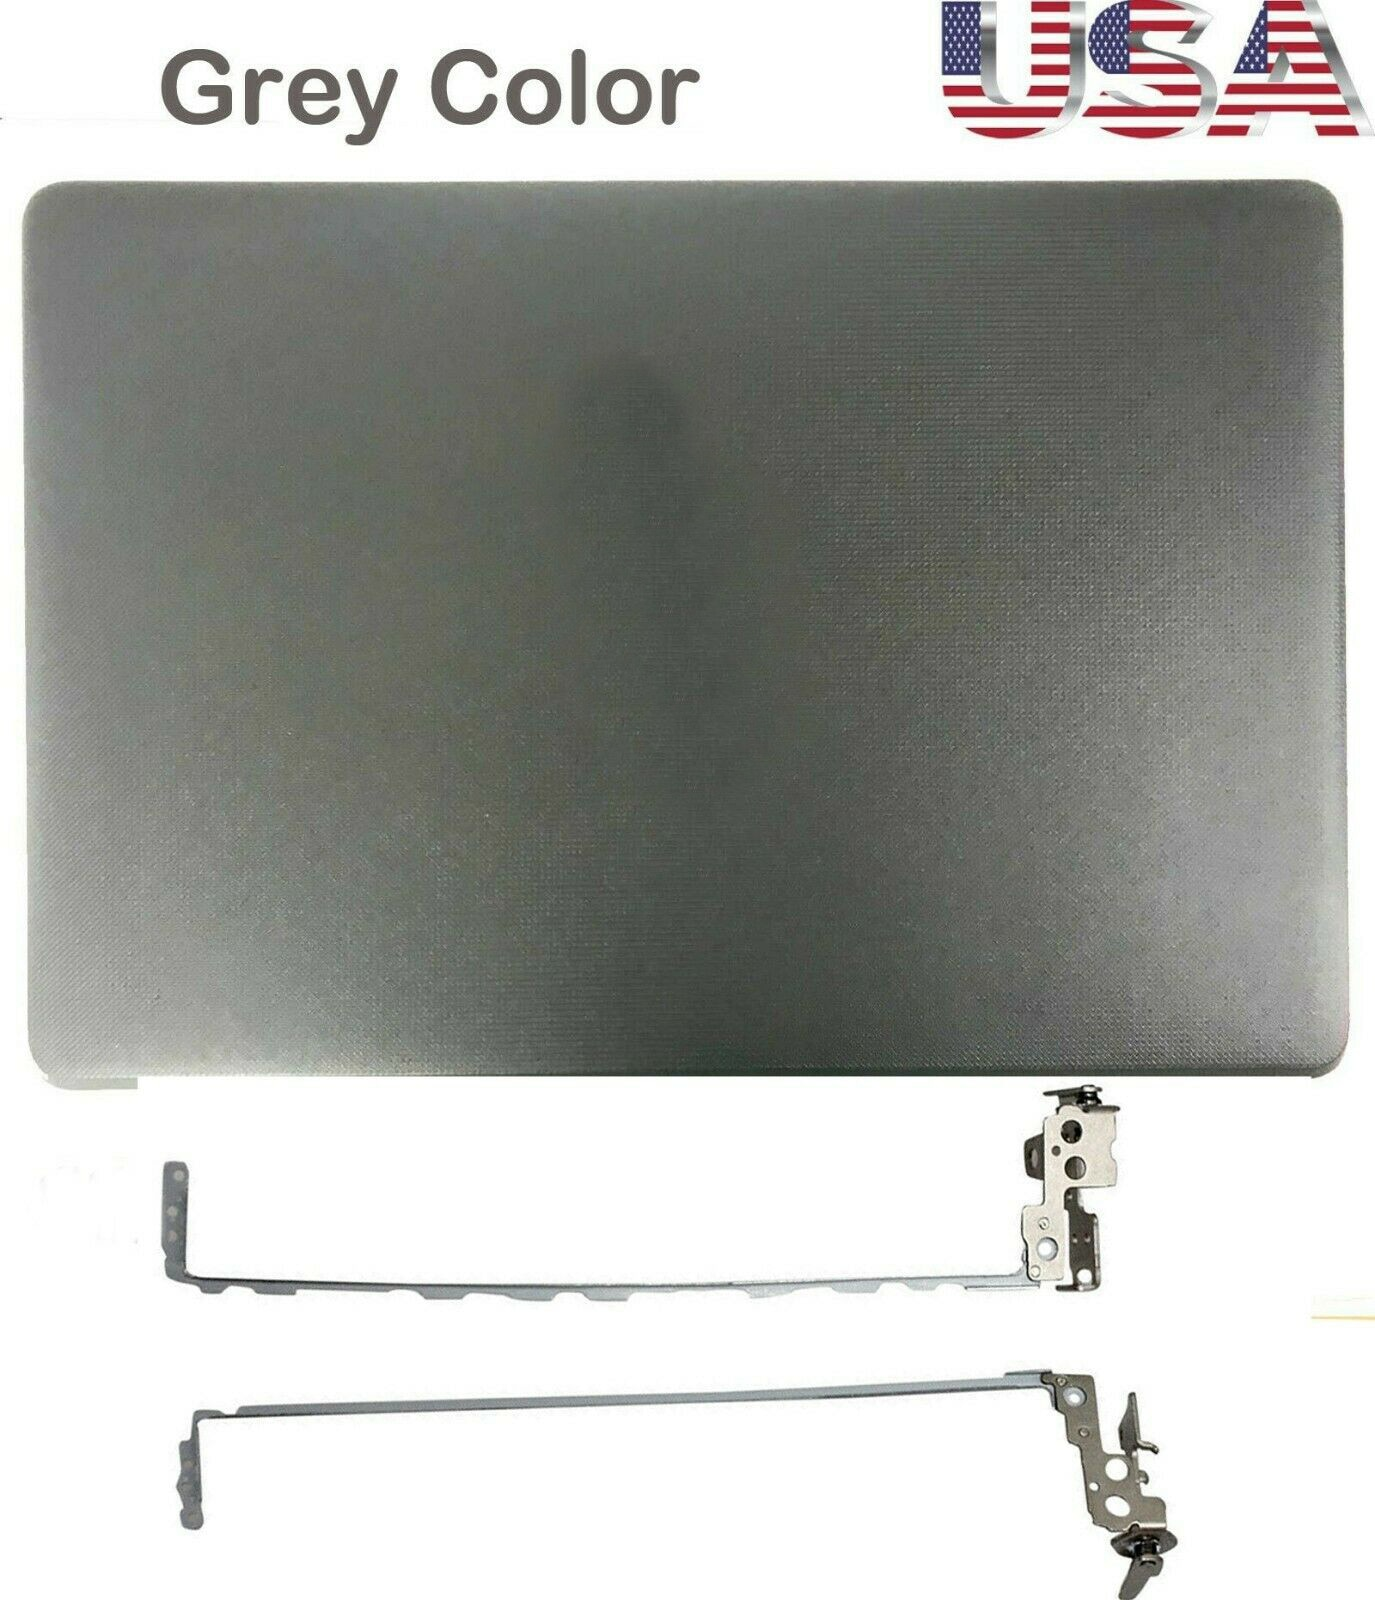 JIANGLUN nuevo para HP 15BS 15-BS 15-BW cubierta trasera gris humo 924894-001 + bisagra 925297-001 + bisel